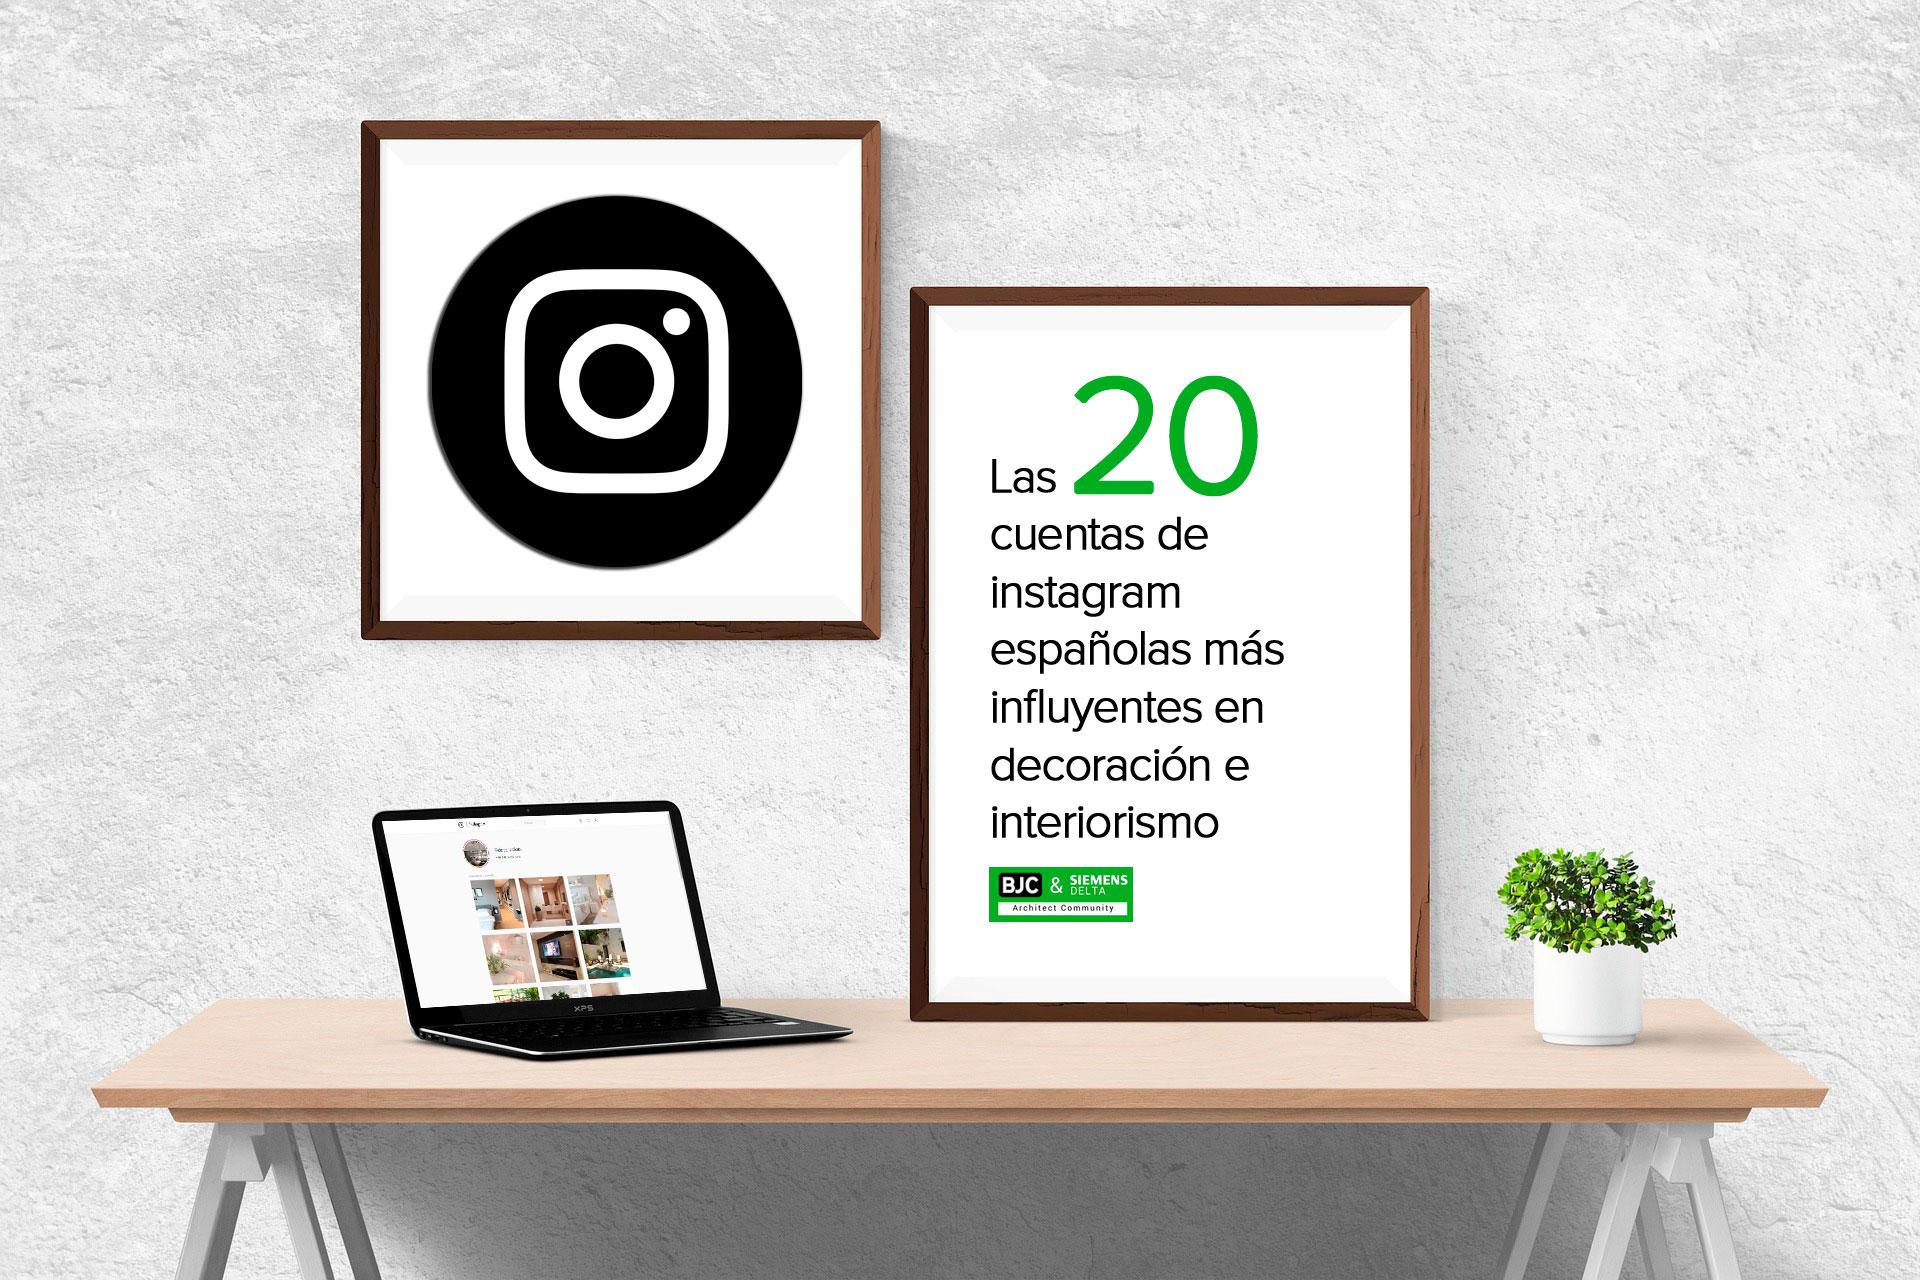 Cuentas De Instagram Espanolas Sobre Decoracion E Interiorismo Bjc - Interioristas-espaoles